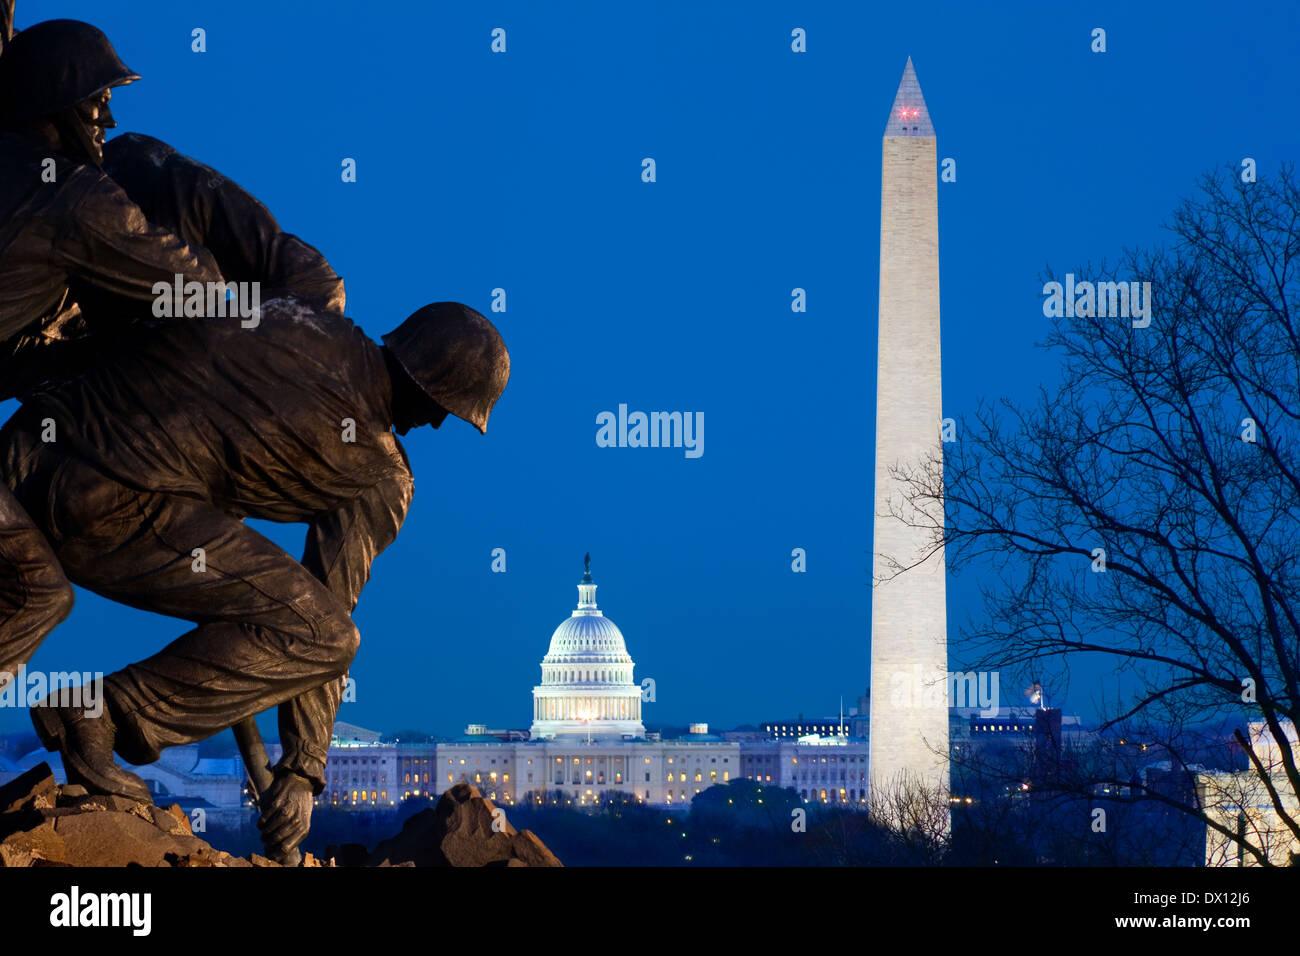 Arlington Marine Corps War Memorial or Iwo Jima Flag Statue; DC skyline with Lincoln Memorial; Washington Monument; US Capitol - Stock Image